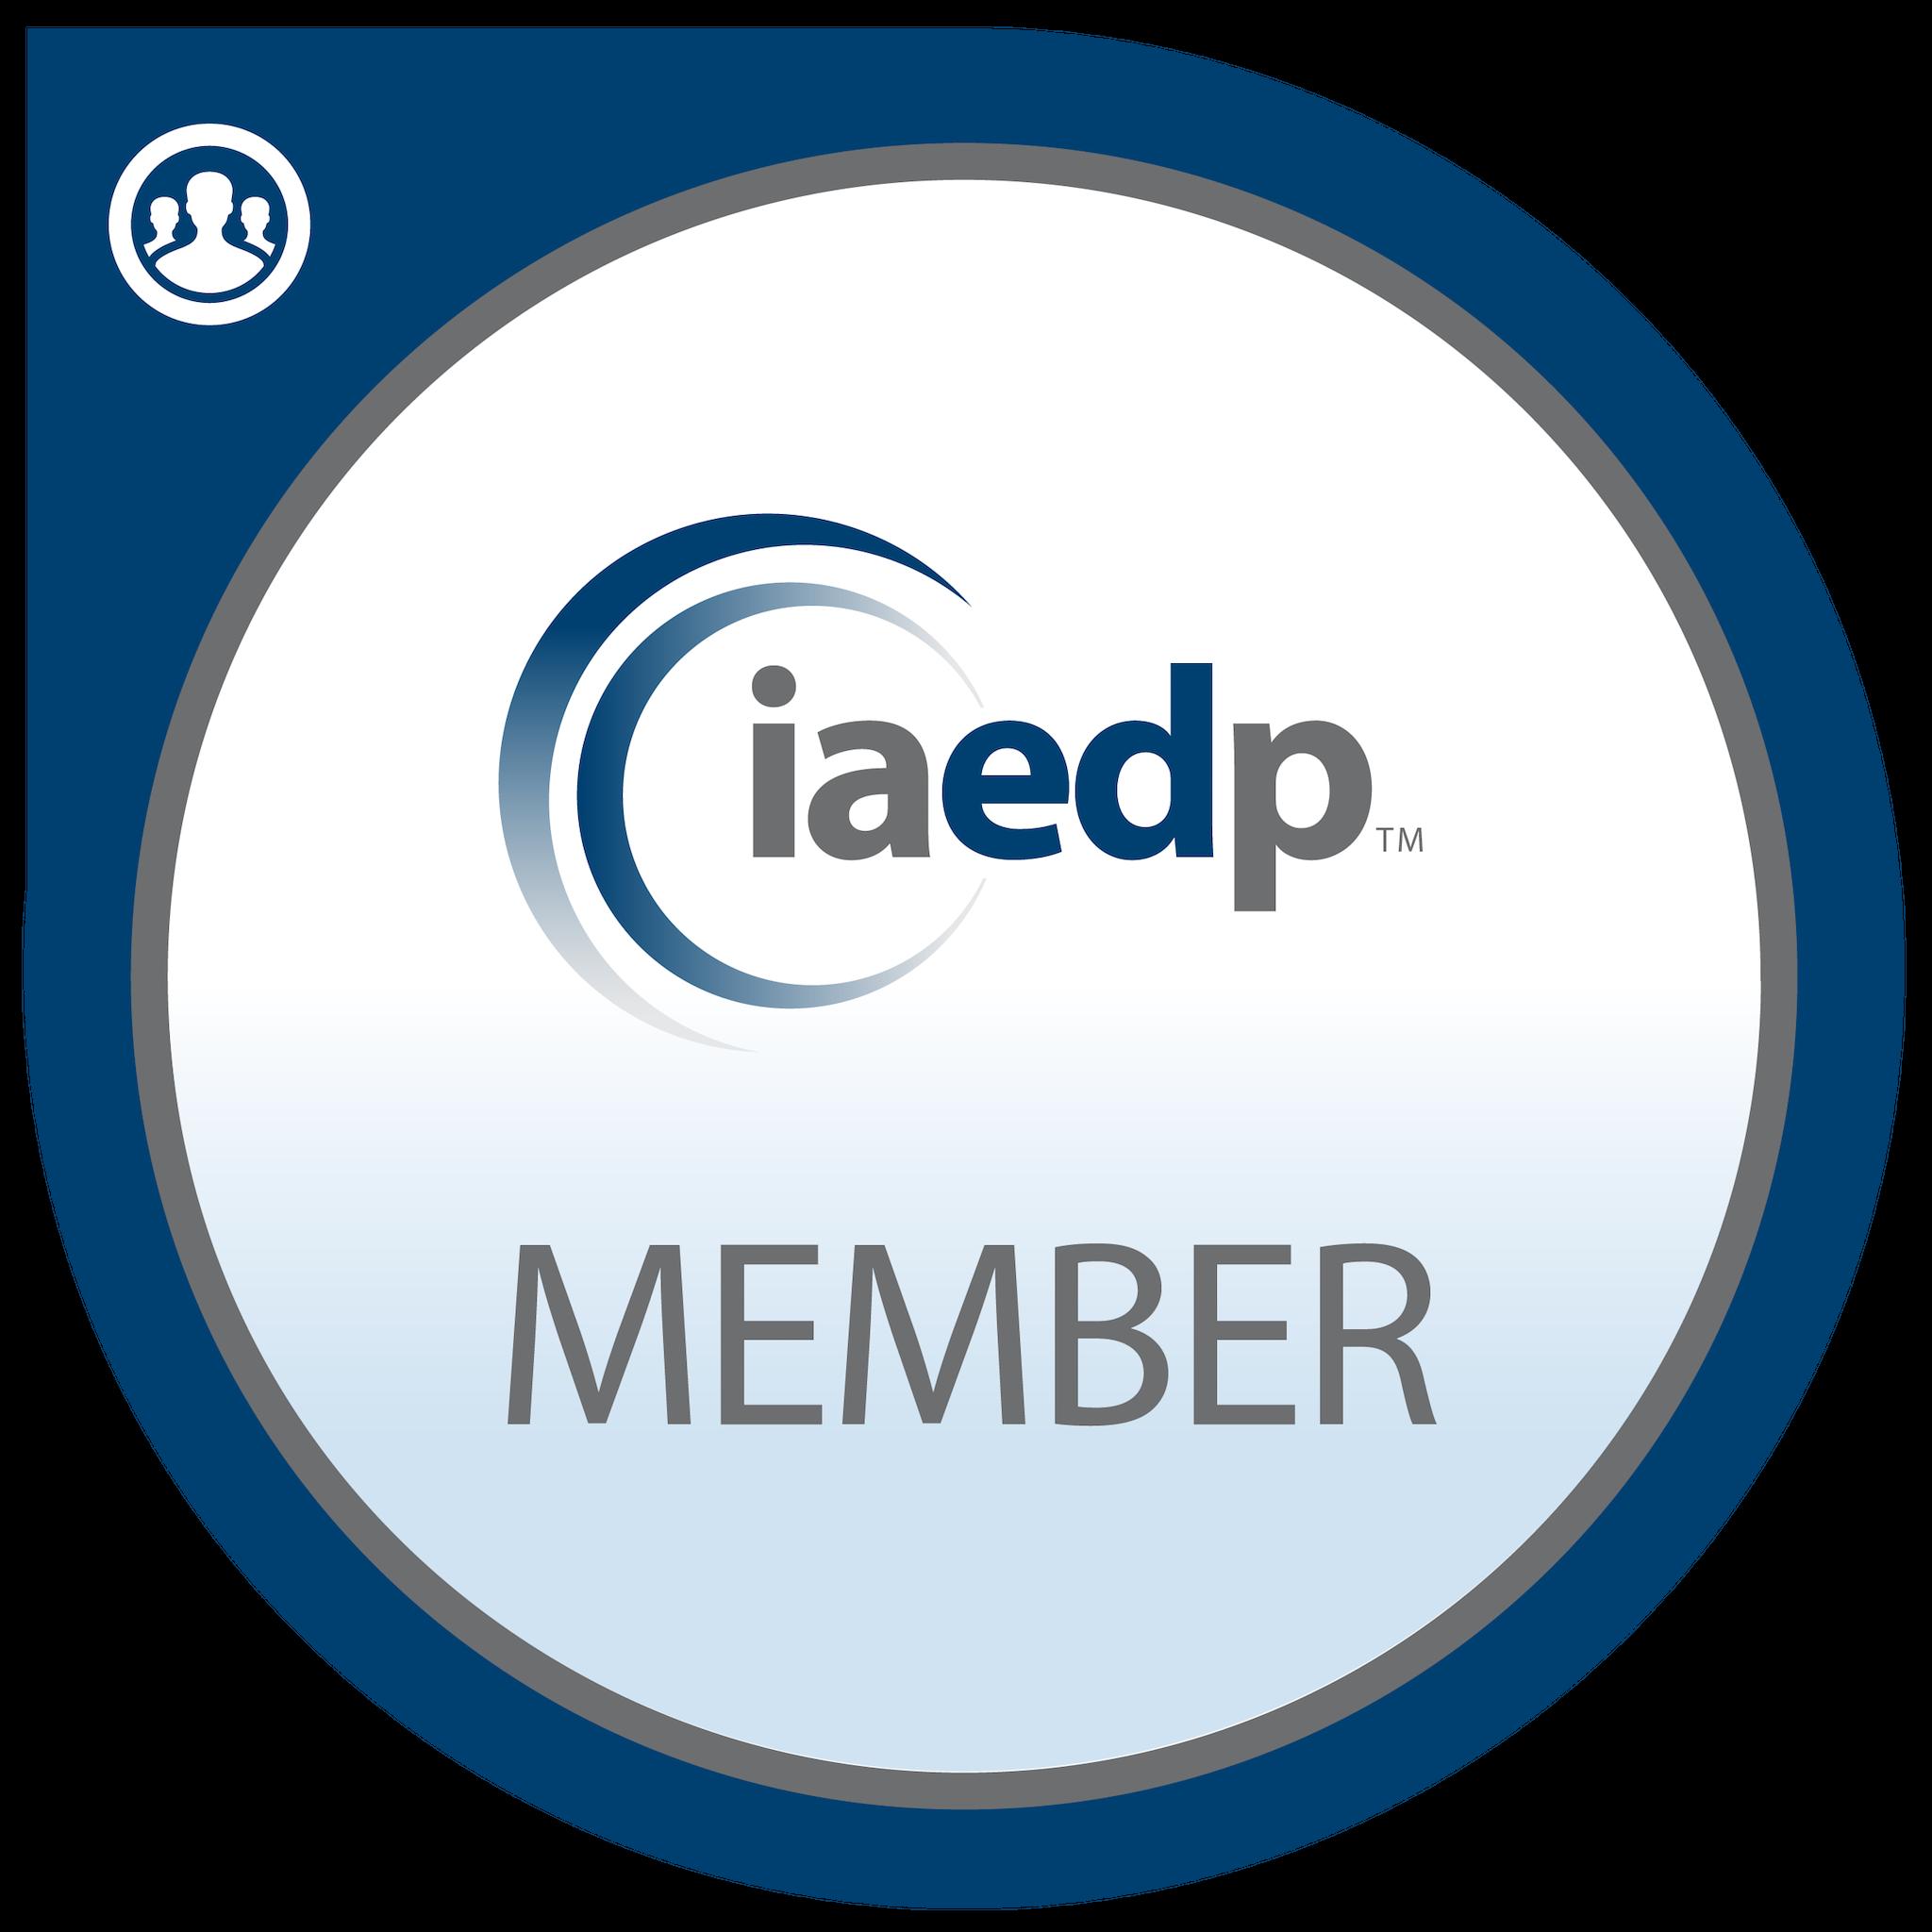 iaedp Member